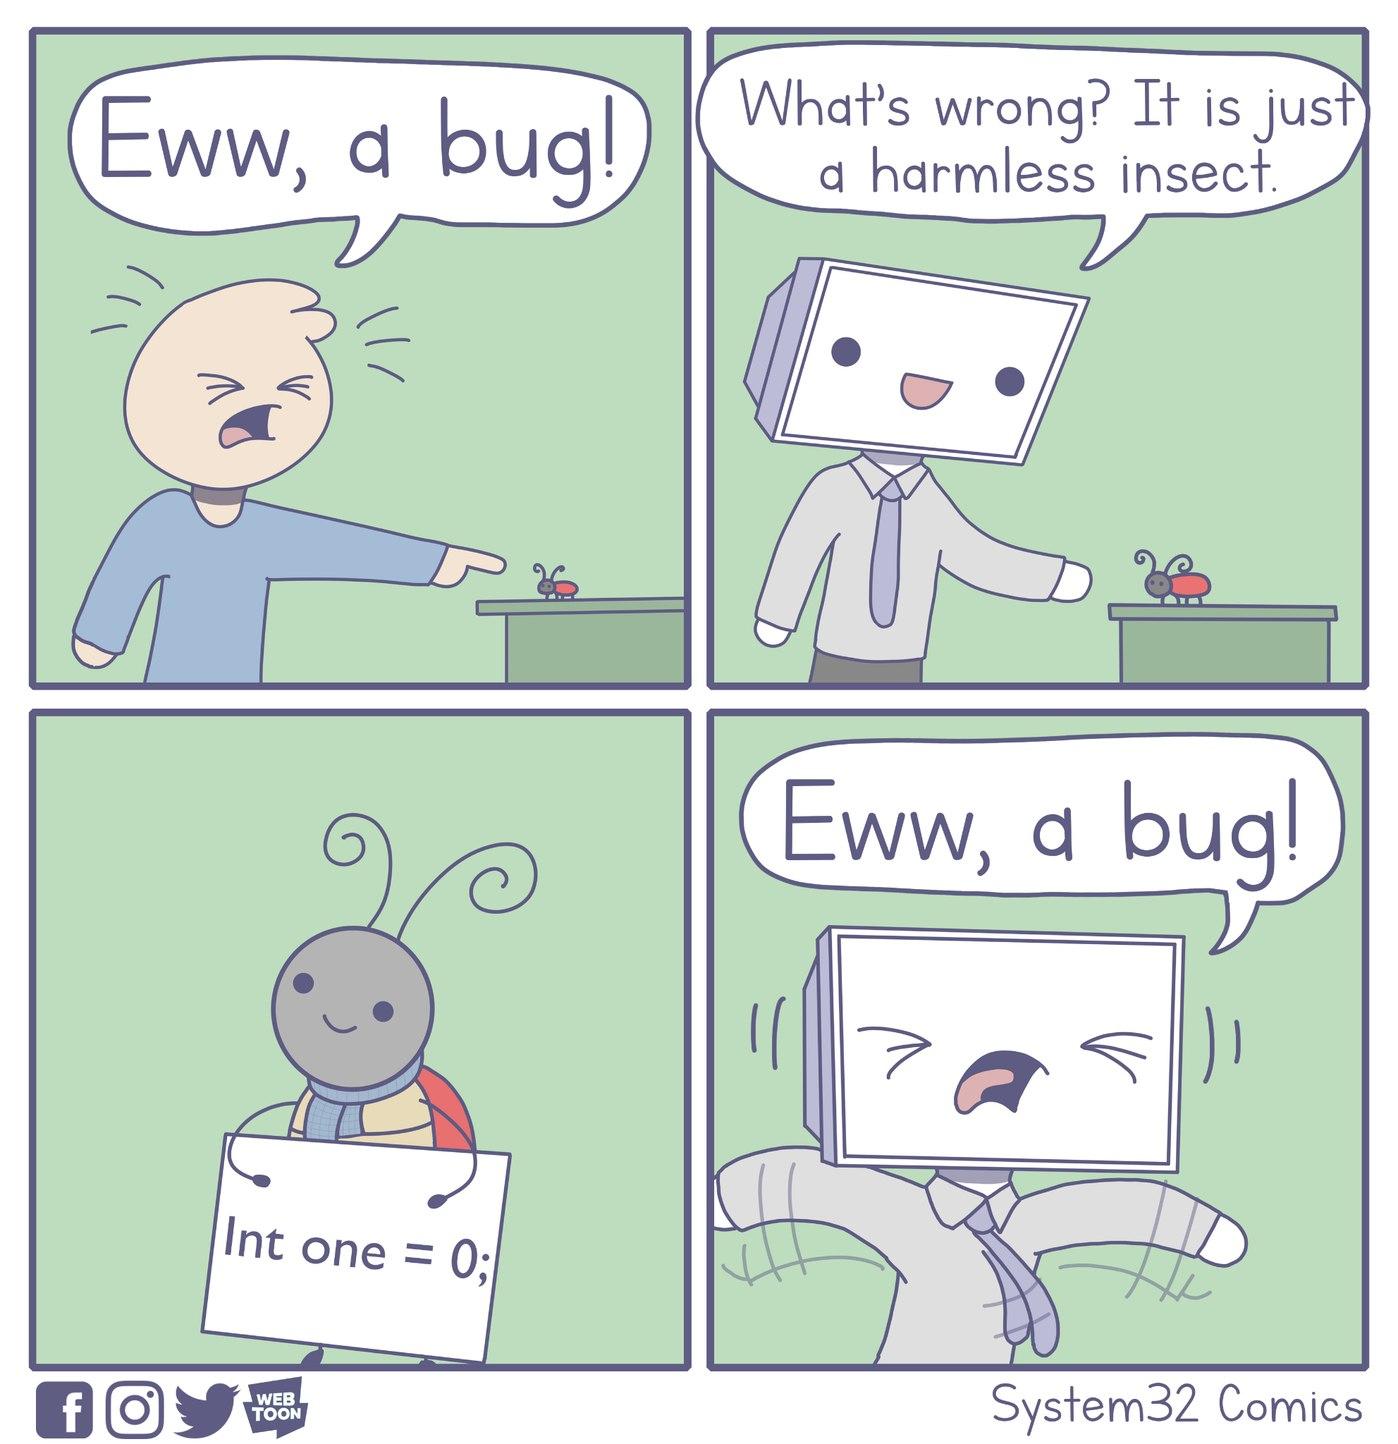 Eww a bug! - meme